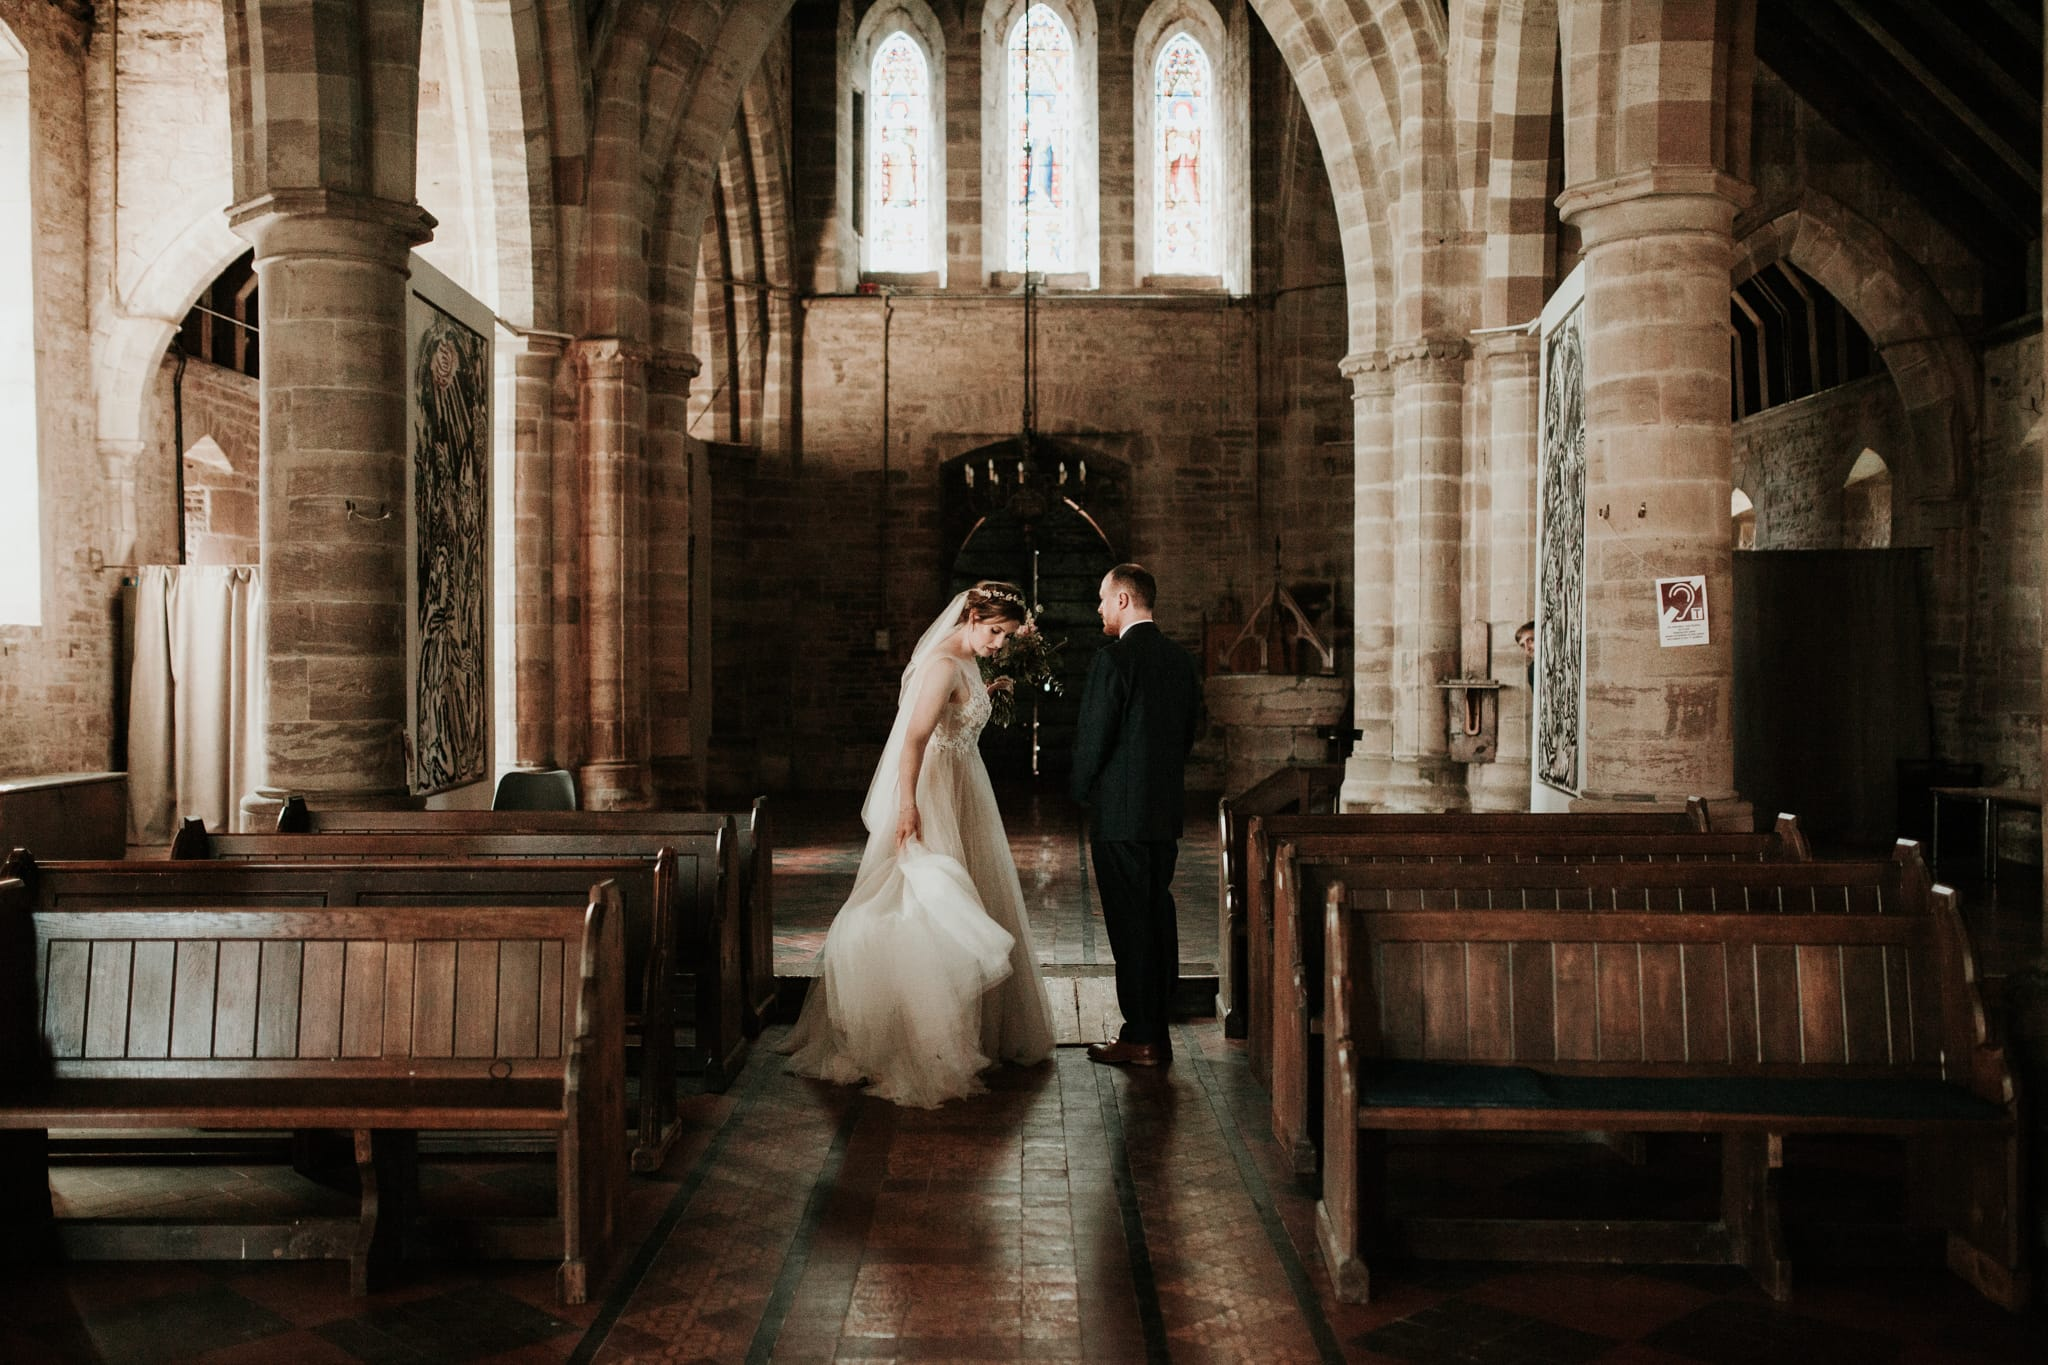 Madley-Parish-Church-Wedding-Herefordshire-weddding-photographer.jpg